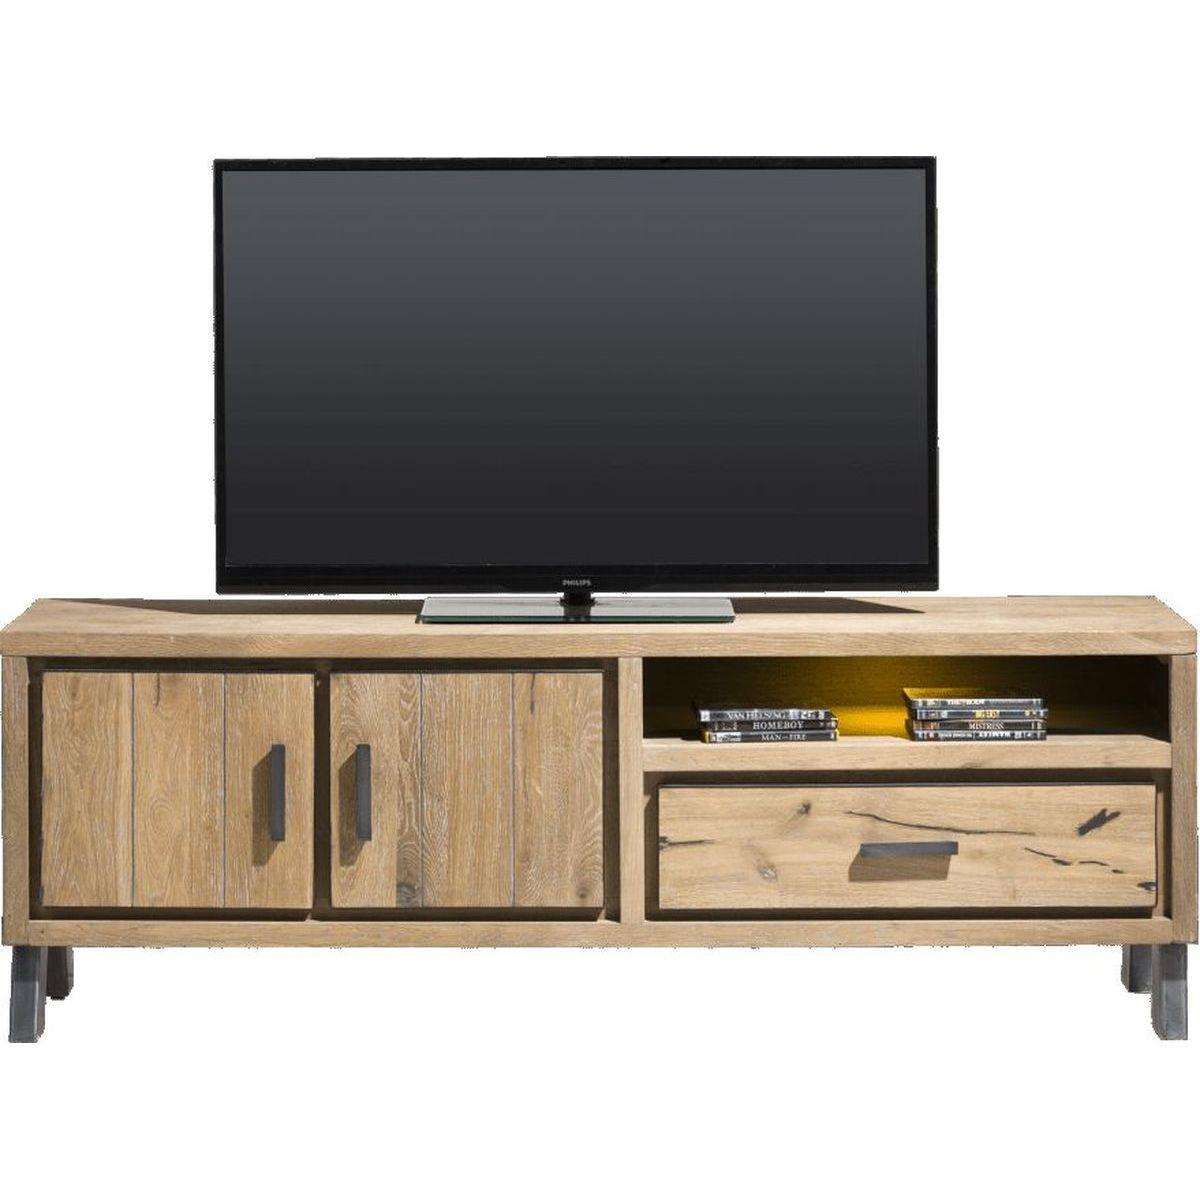 Meuble TV VITORIA HetH 170cm LED